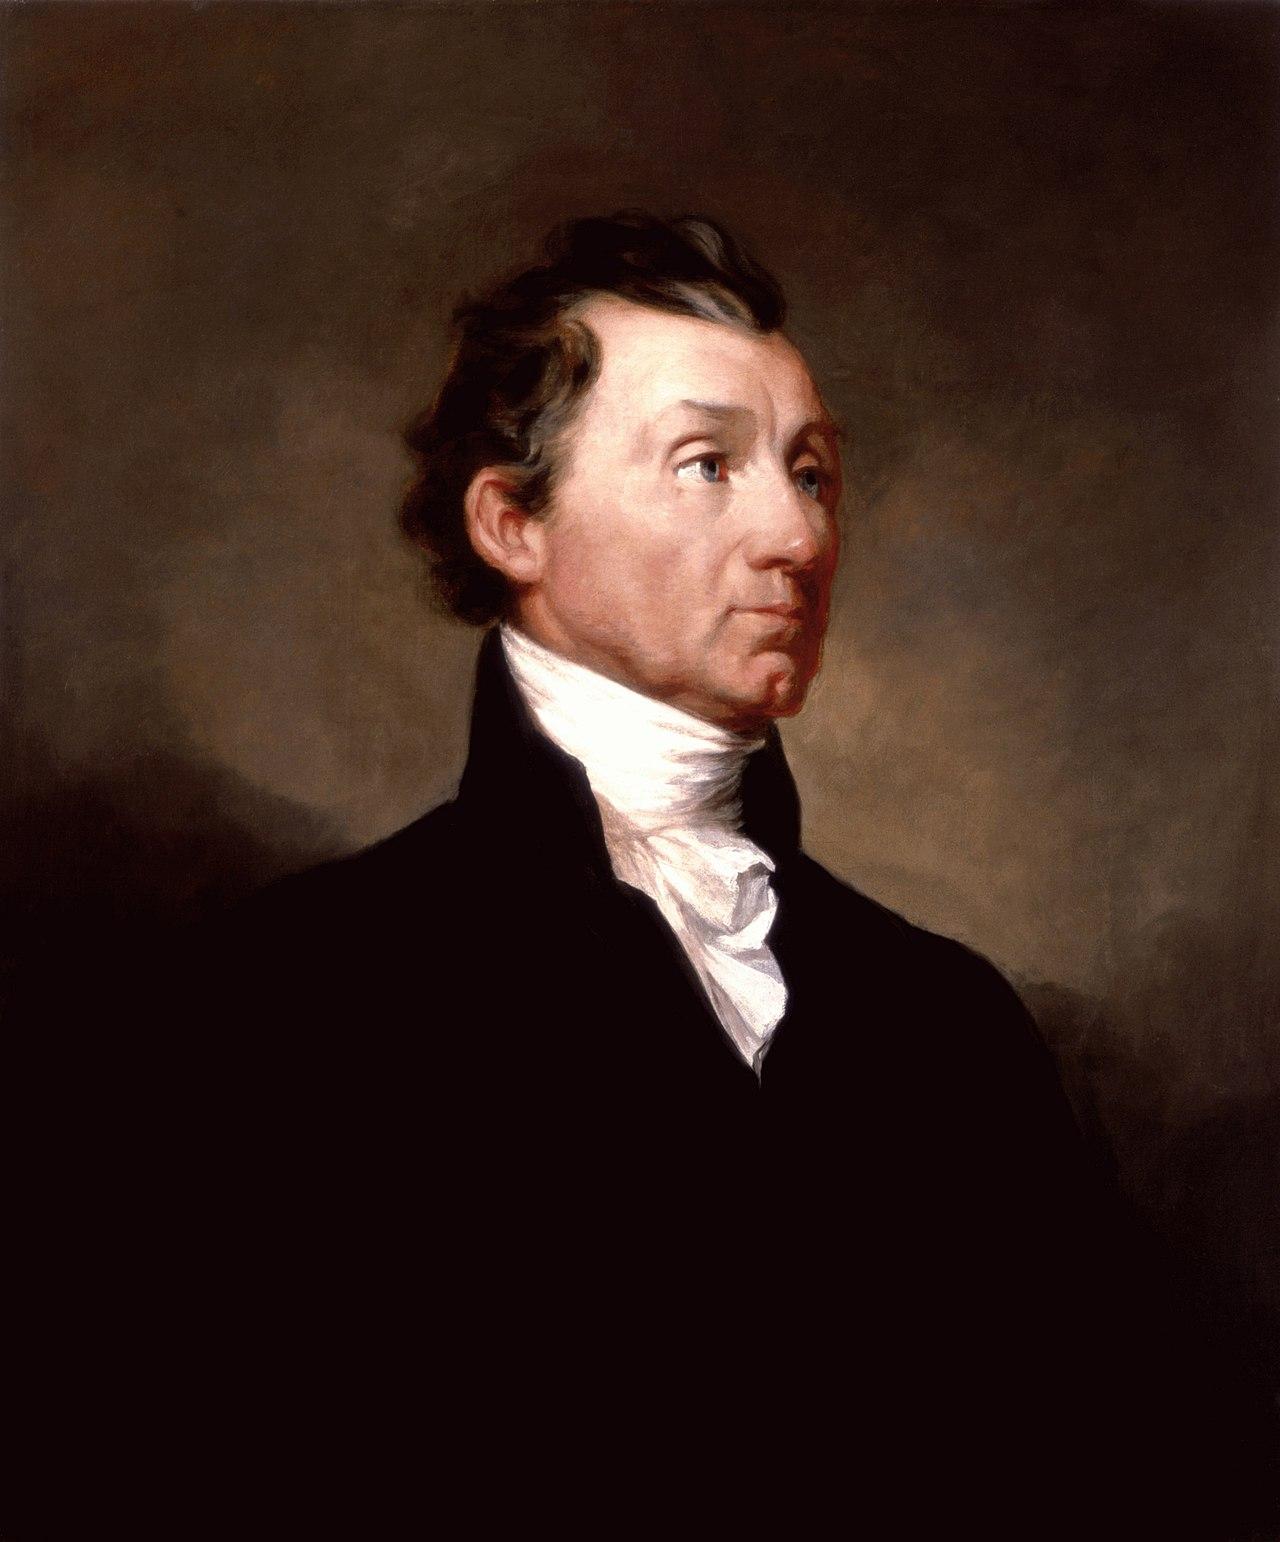 James Monroe White House portrait 1819.jpg